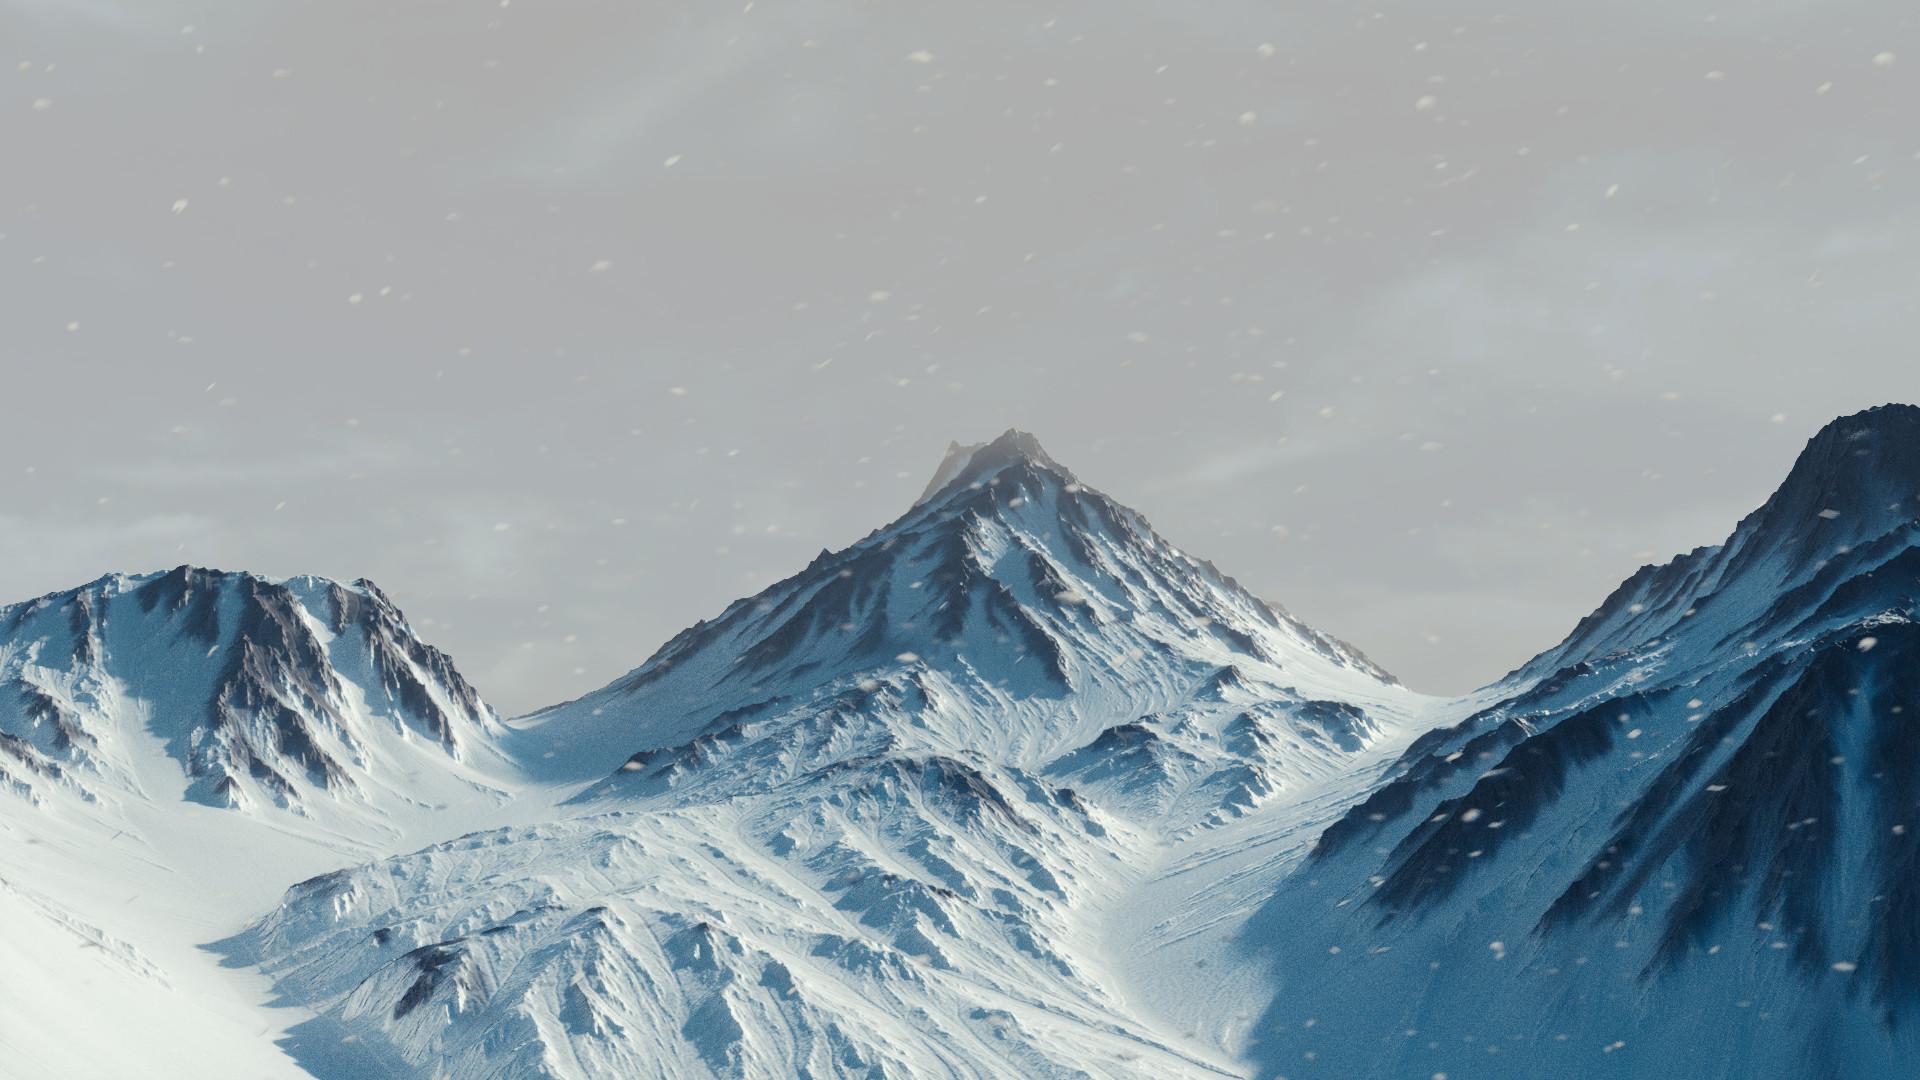 2k background